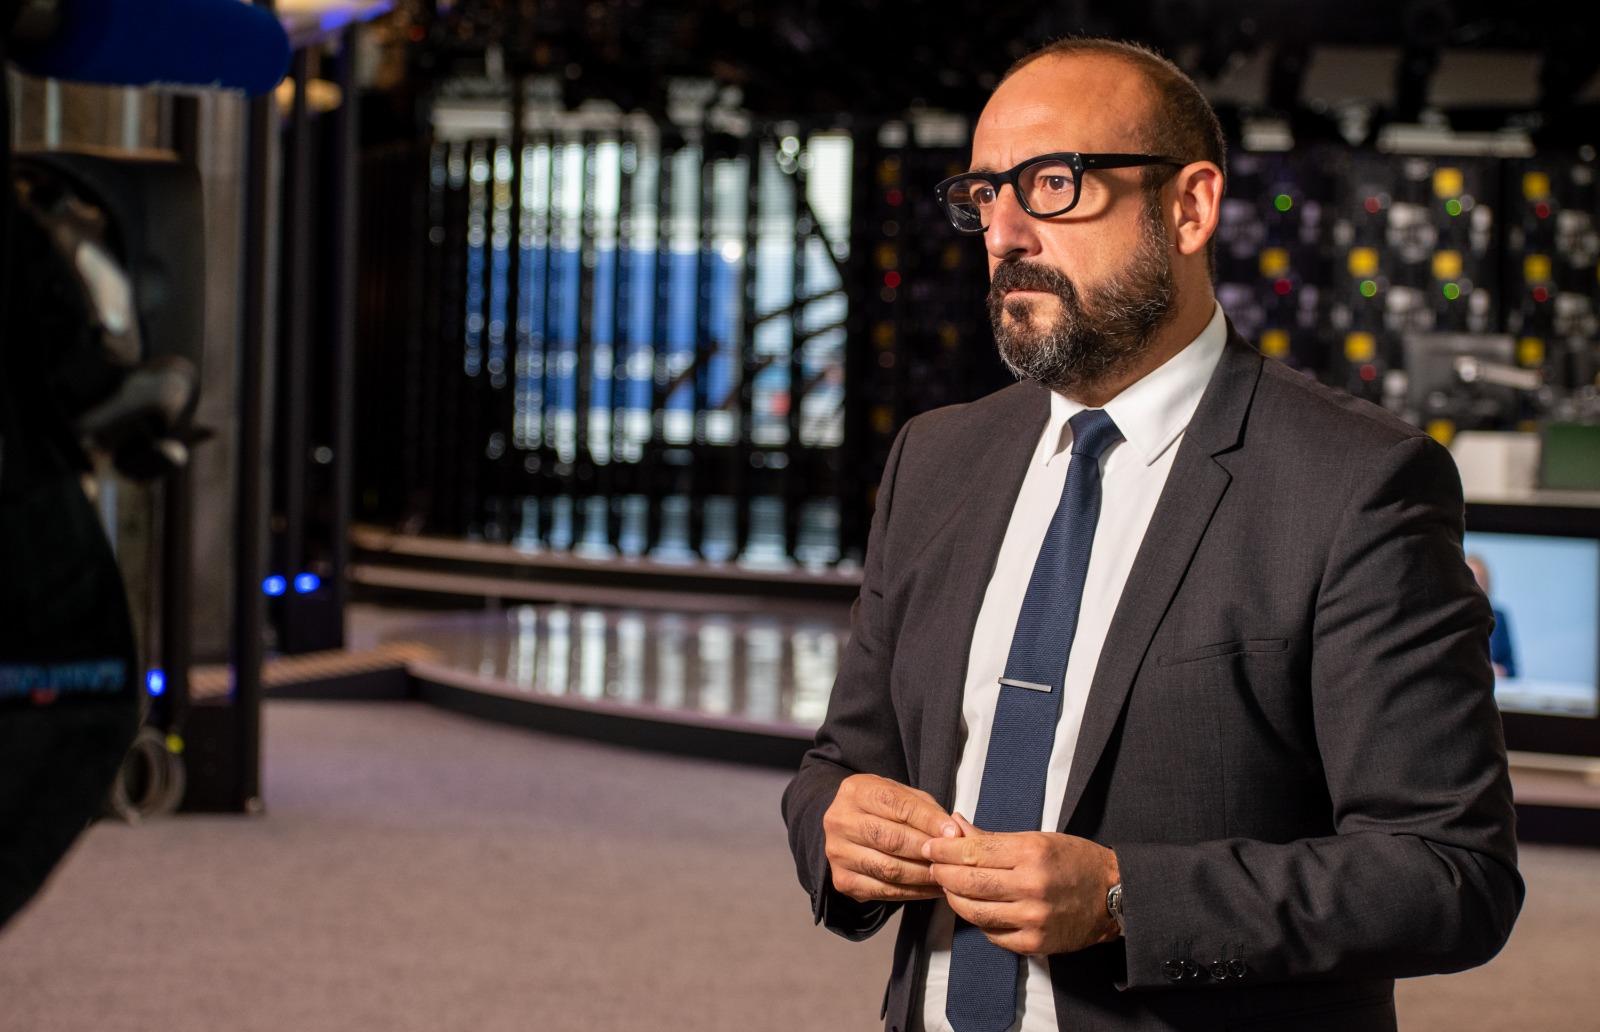 El eurodiputado de Ciudadanos, Jordi Cañas | Cs/Archivo